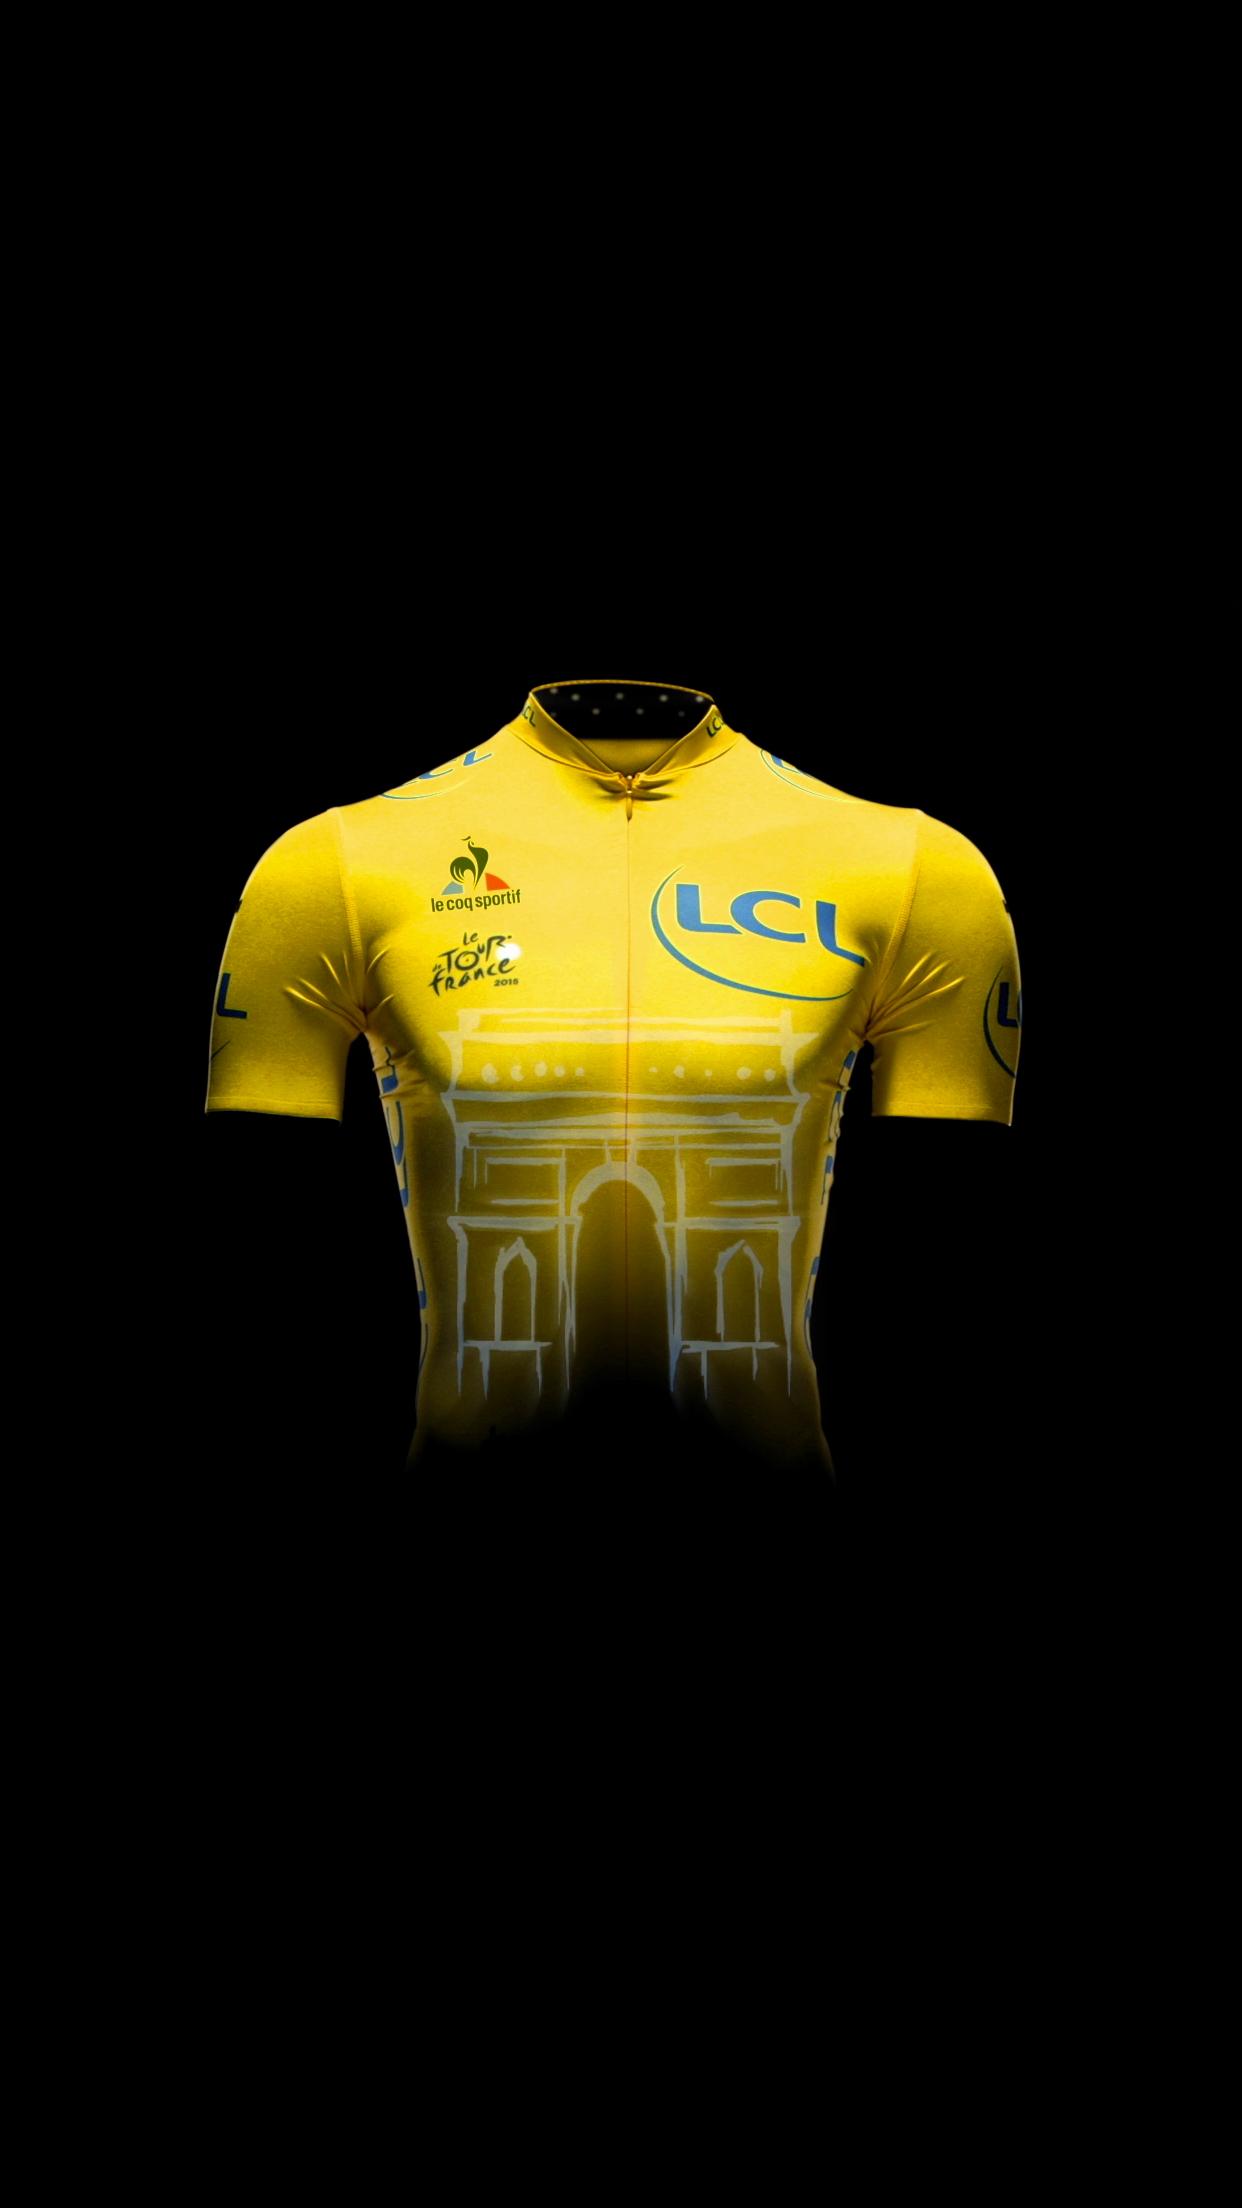 Wallpaper HD iPhone X 8 7 6   Tour de France 2015 1242x2208